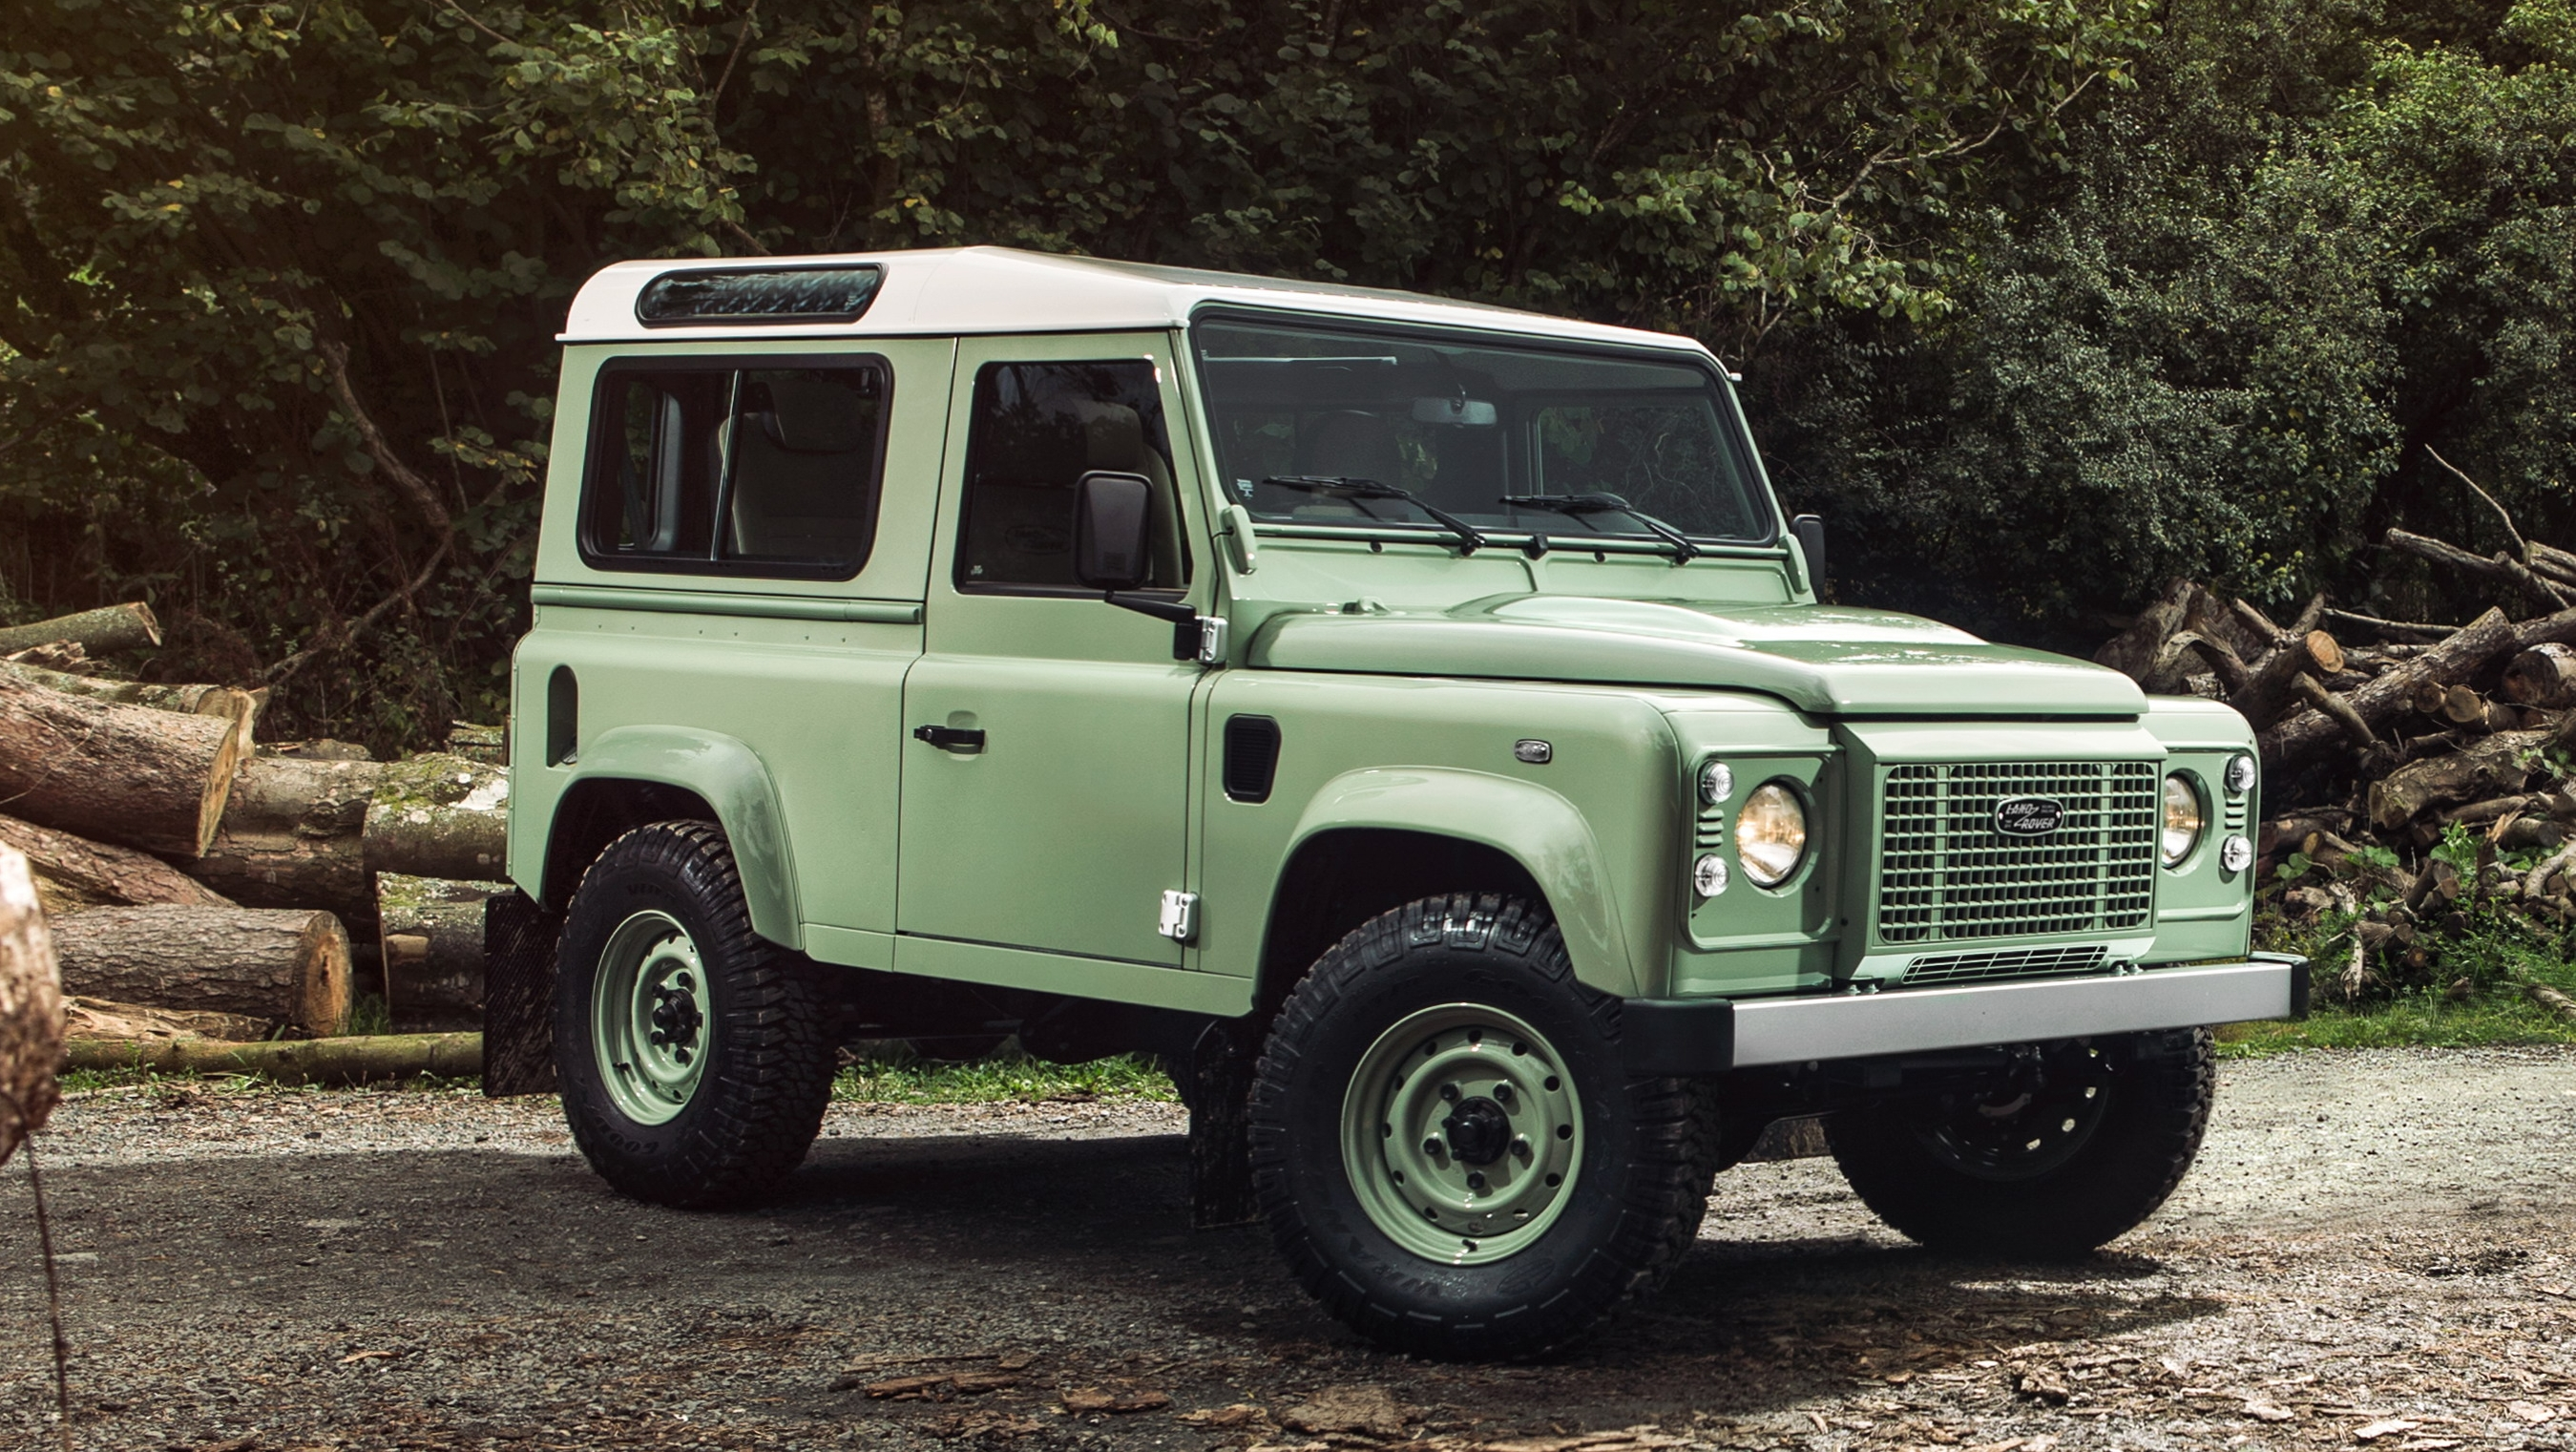 Next Gen Land Rover Defender Reported For 2019 Debut News